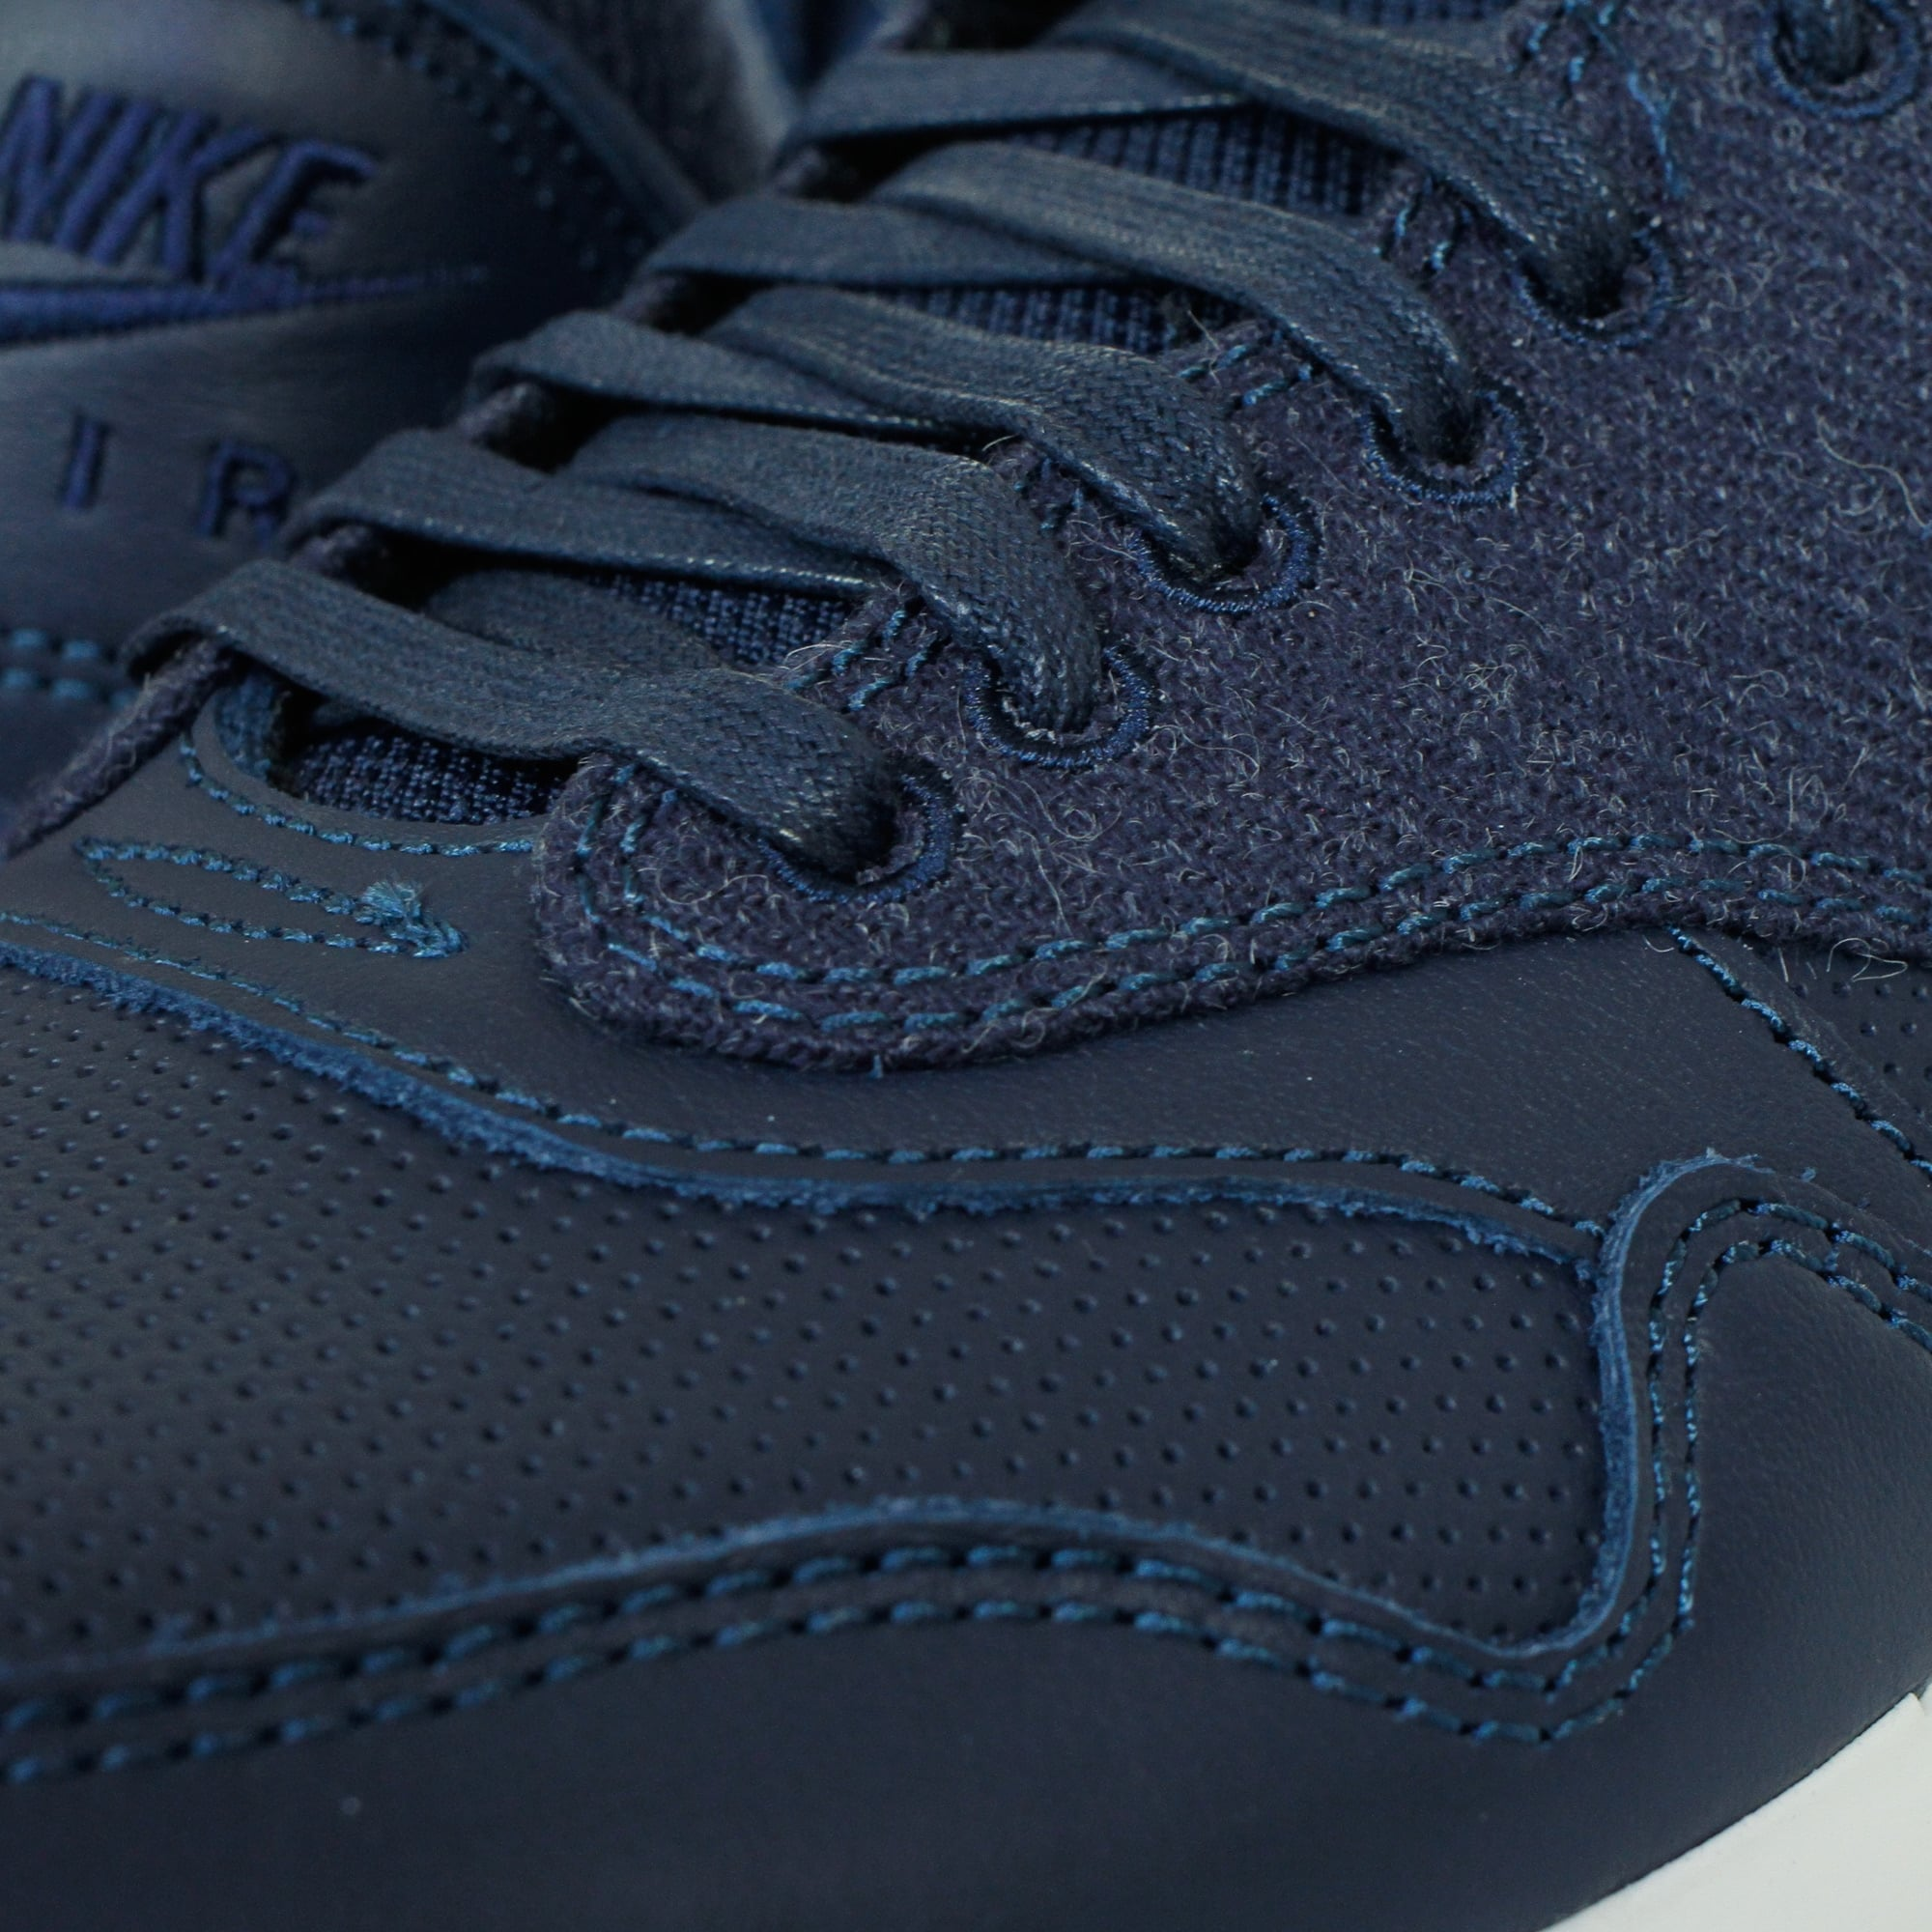 Nike Air Odyssey LX Navy Shoe 806811 400 730d63812463